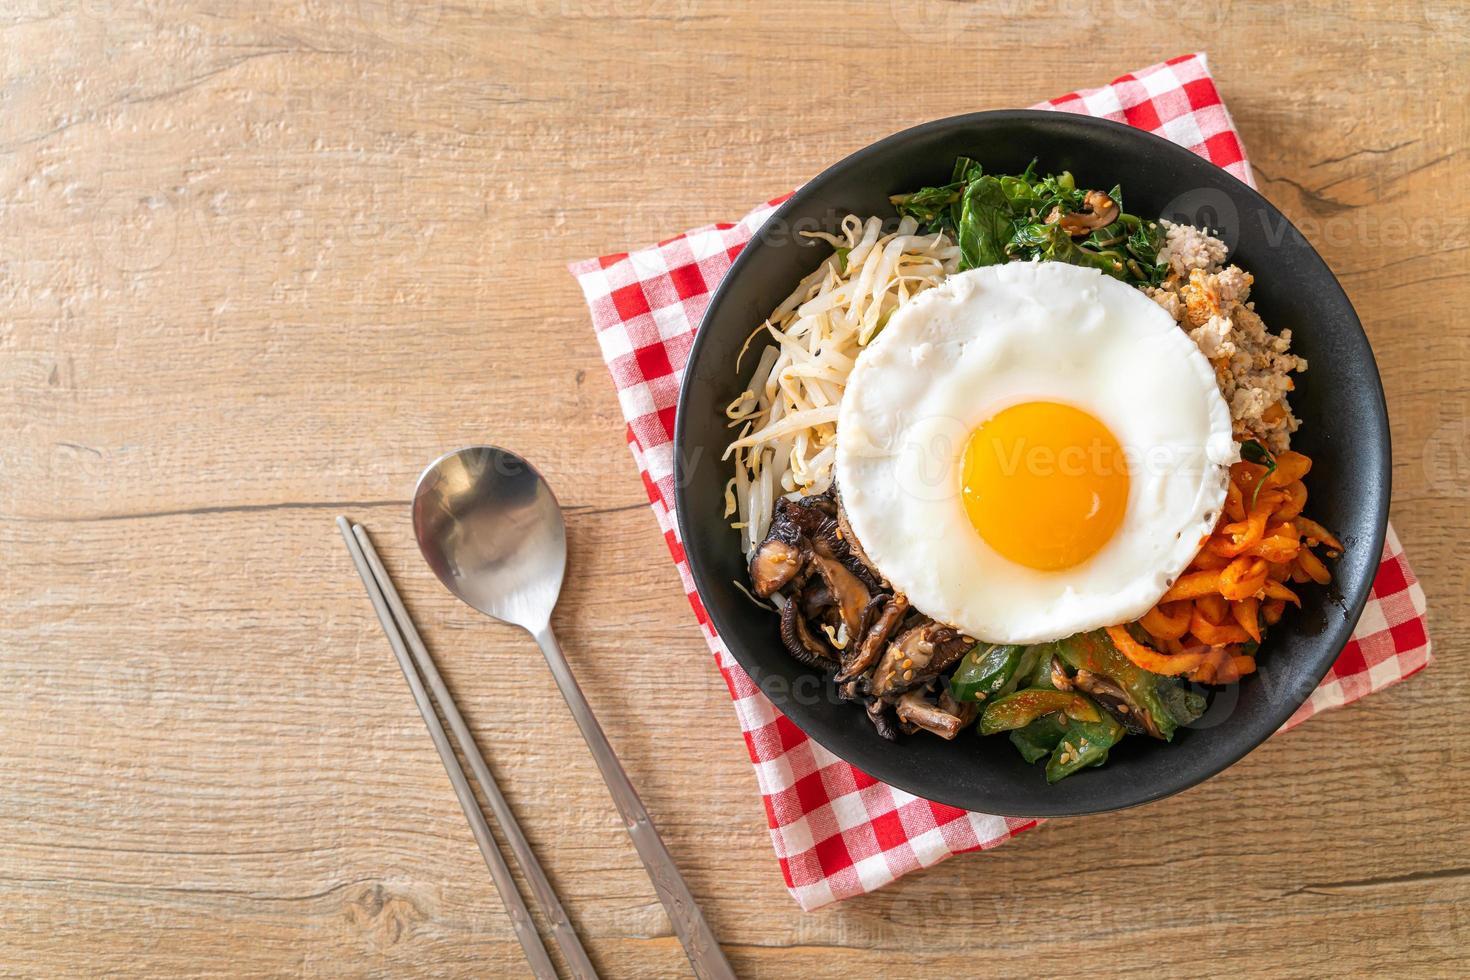 Salada picante coreana com arroz - comida tradicional coreana, bibimbap foto